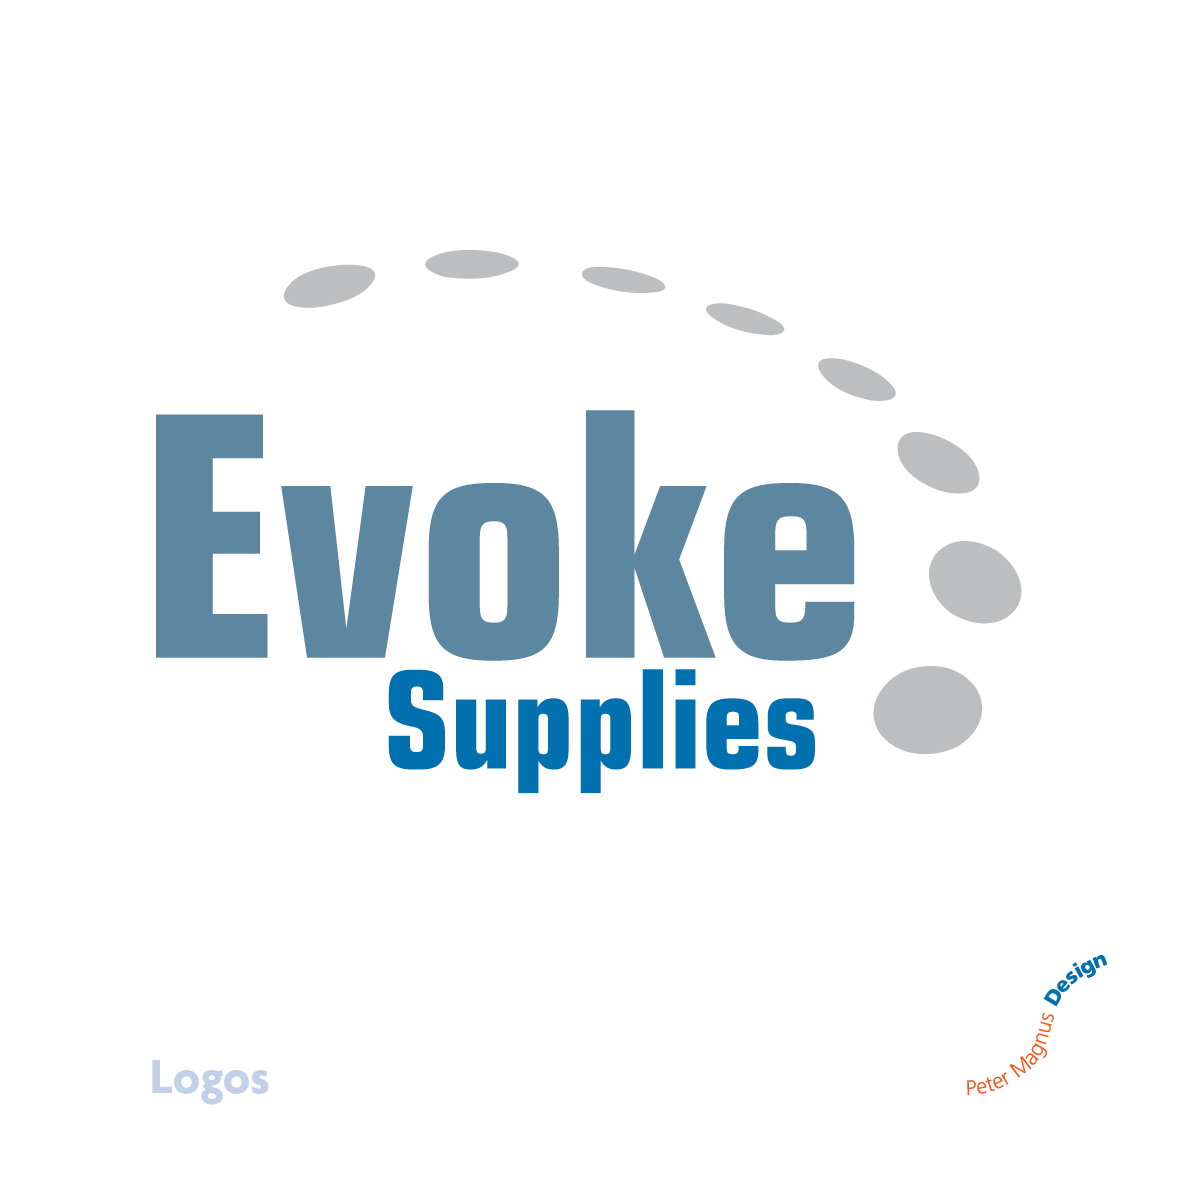 Evoke Supplies logo, engineering products company